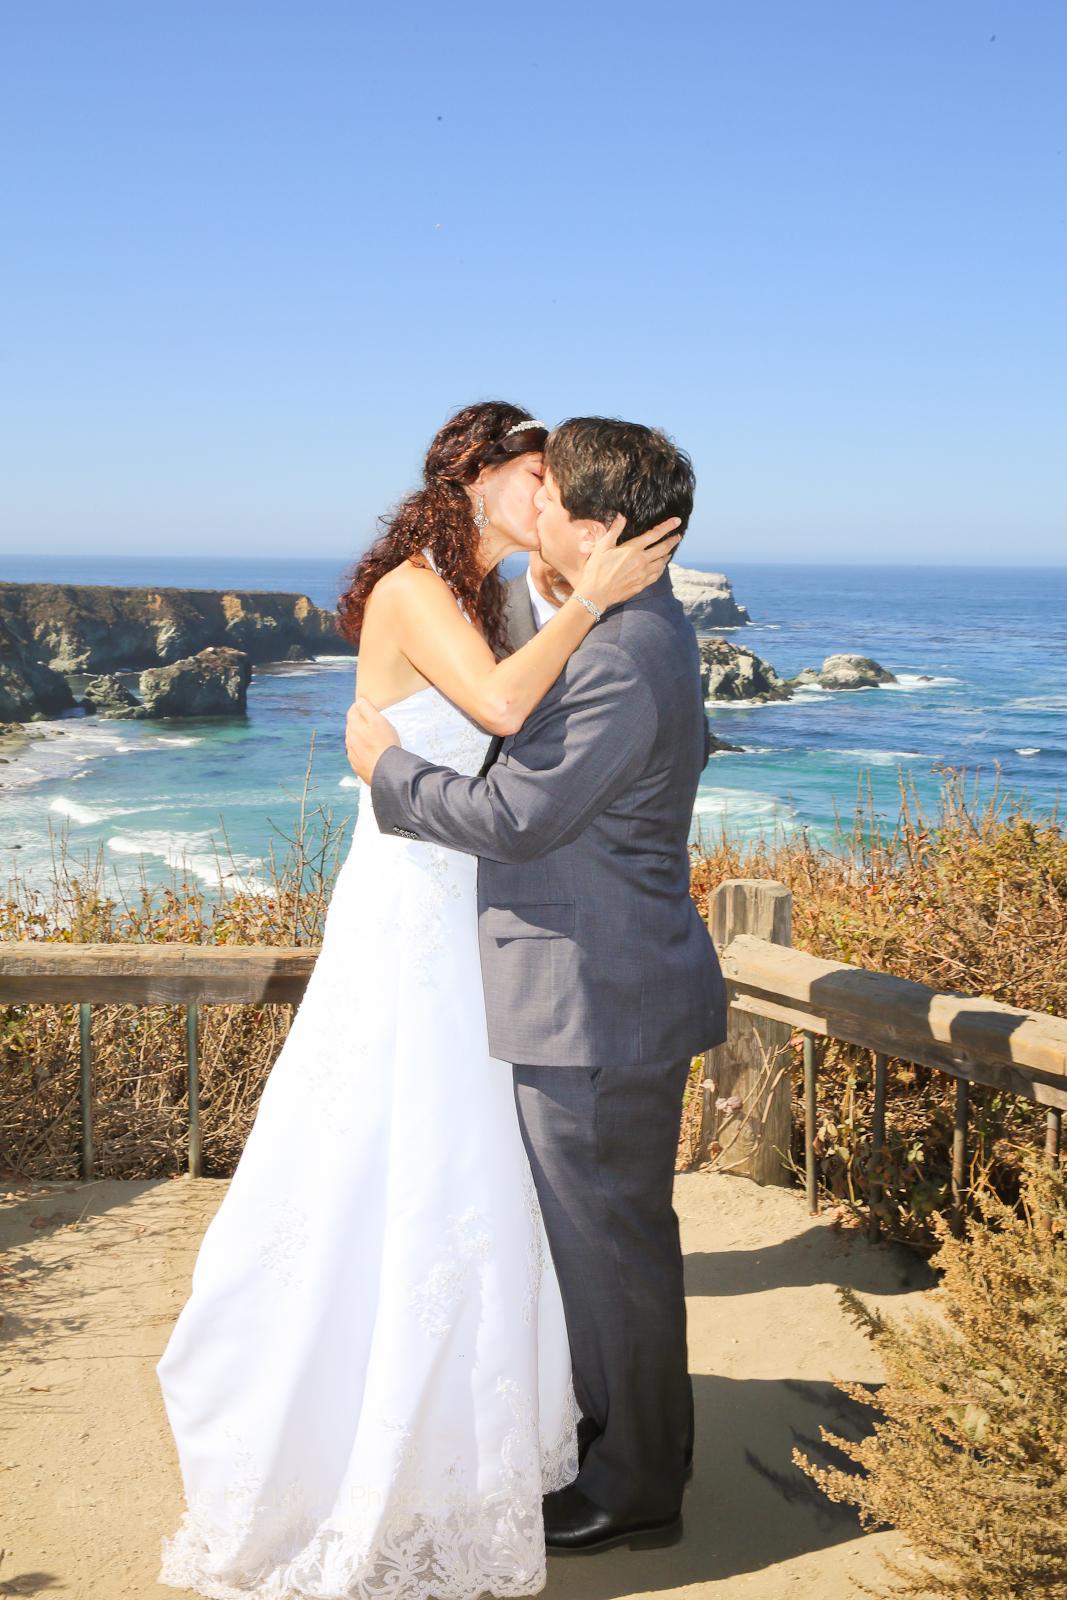 destination-wedding_small-wedding_big-sur_california-coast_ocean-view_gorda_wedding-photographer_debbie-markham-4273